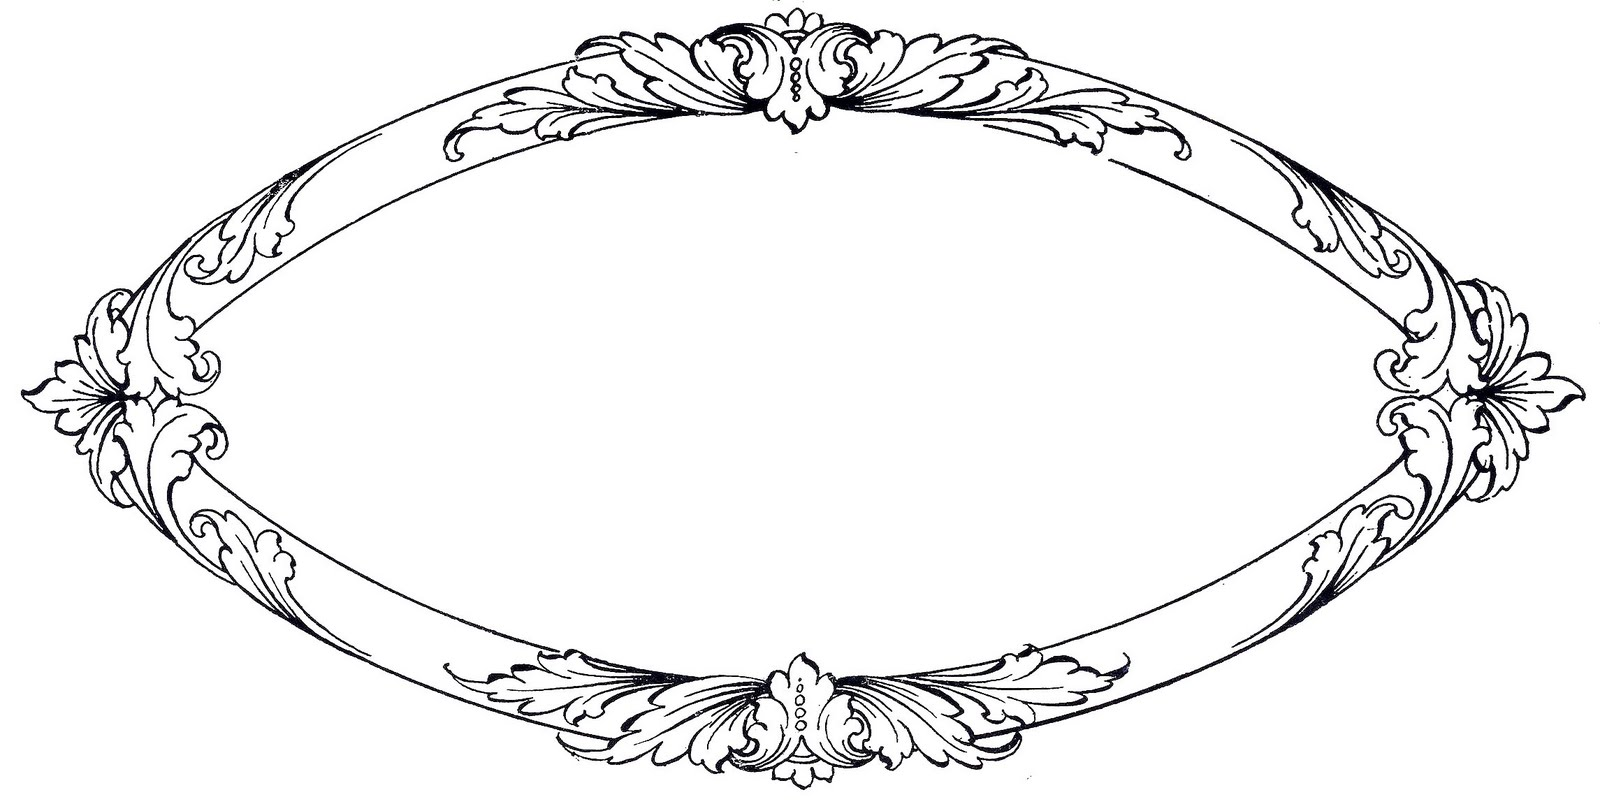 Antique oval frame free download best antique oval frame on 1600x811 vintage clip art jeuxipadfo Gallery